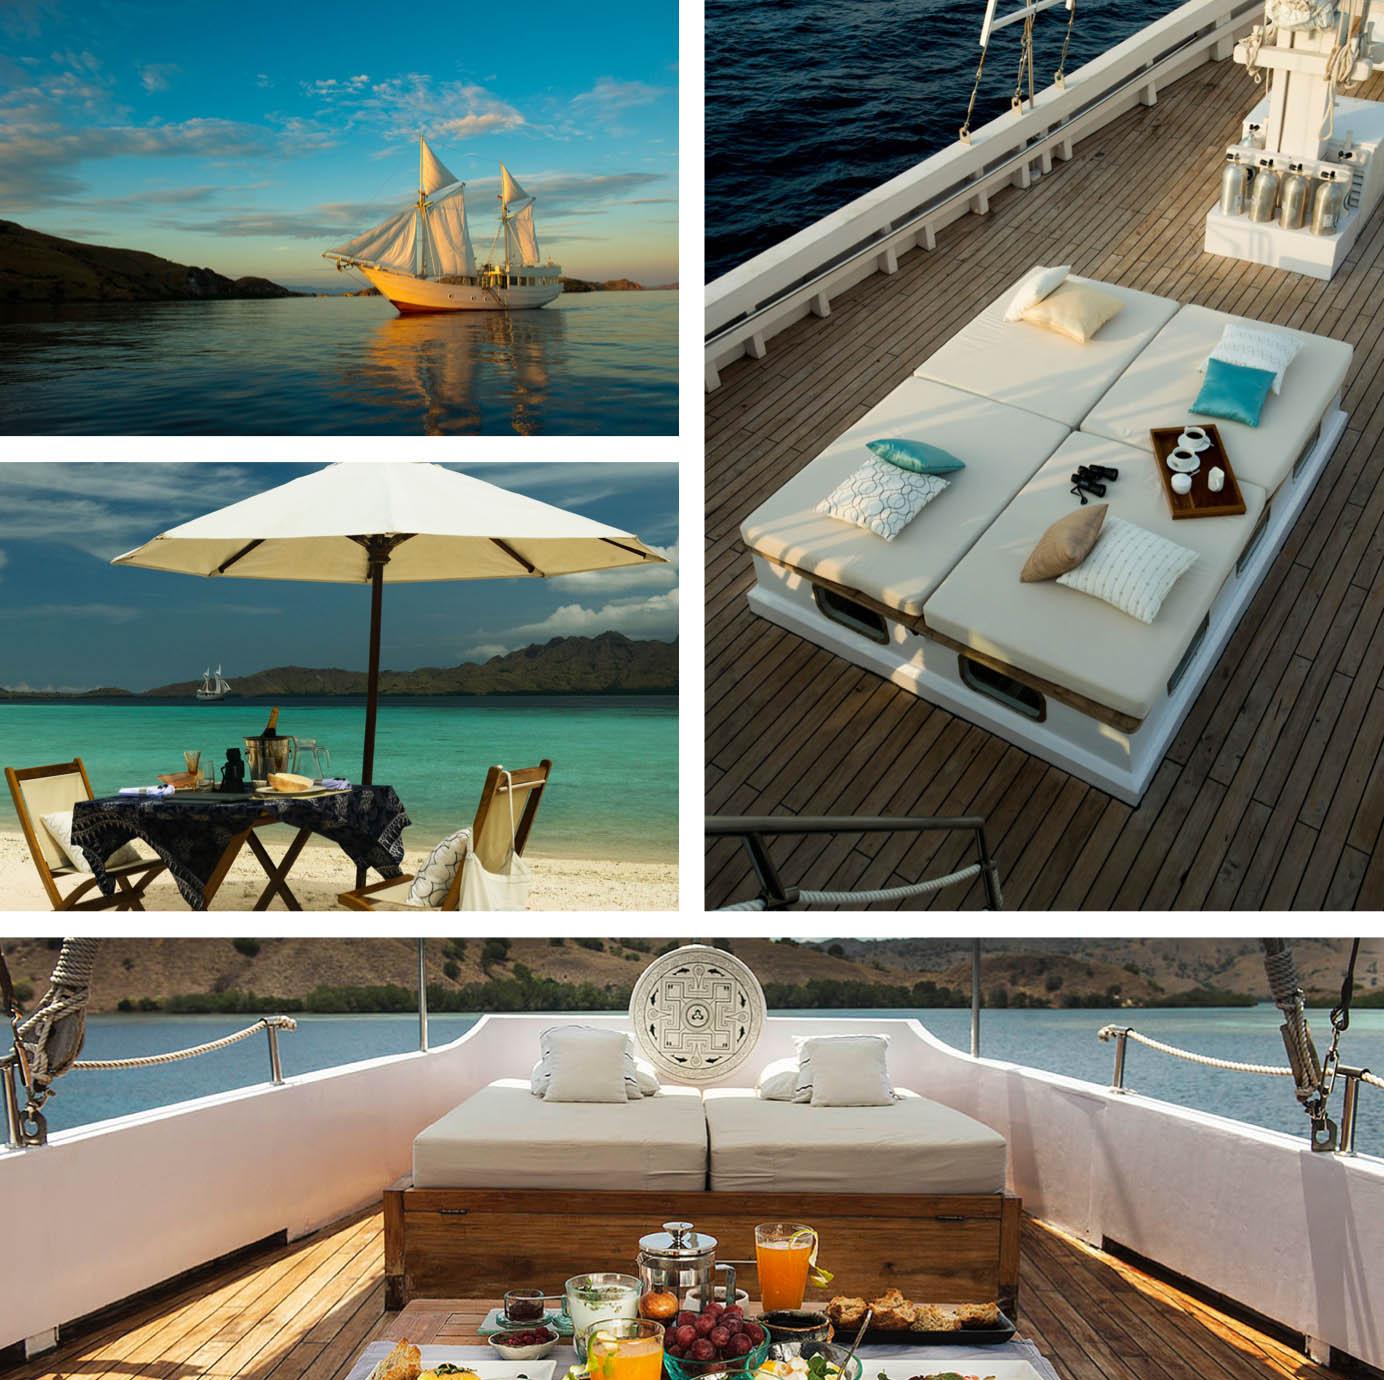 Alexa-Private-Cruises--Collage